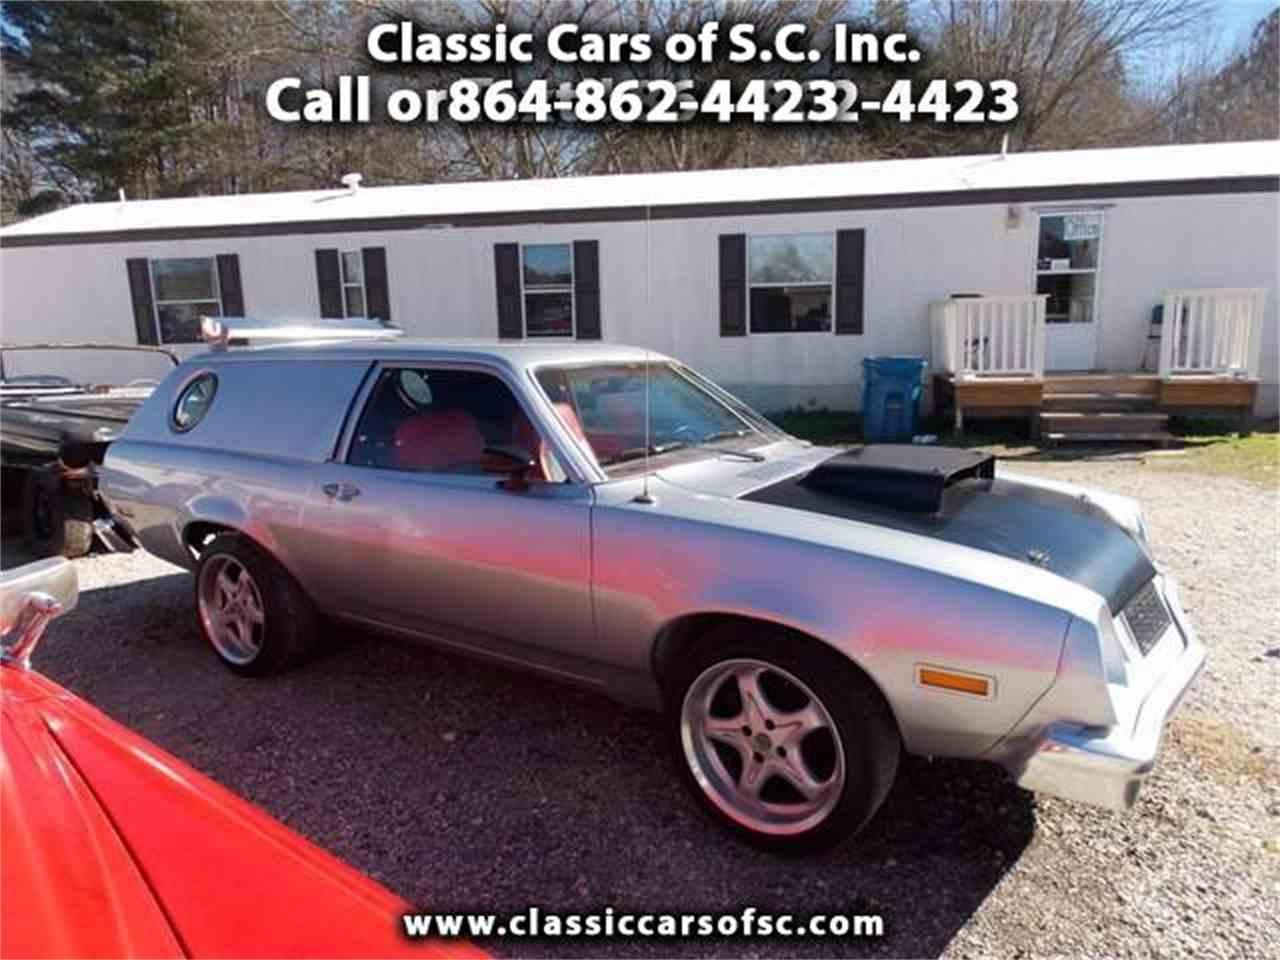 Craigslist Classic Cars For Sale South Carolina